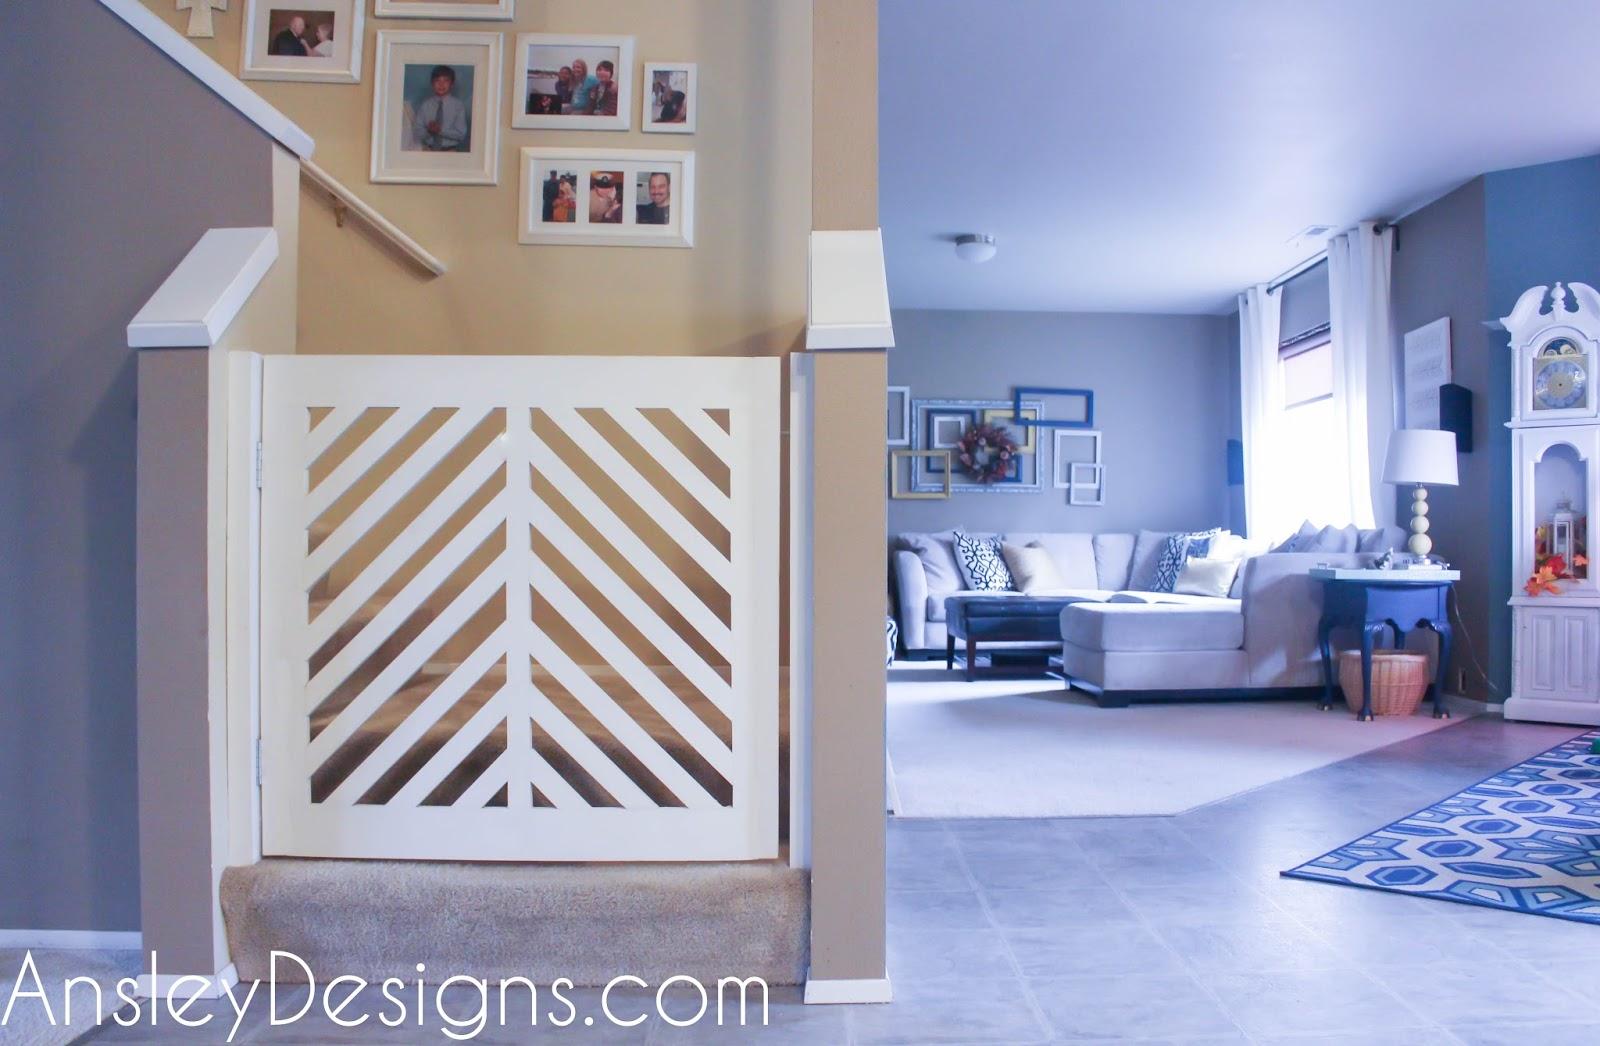 Ansley Designs: DIY Modern Herringbone Baby or Dog Gate